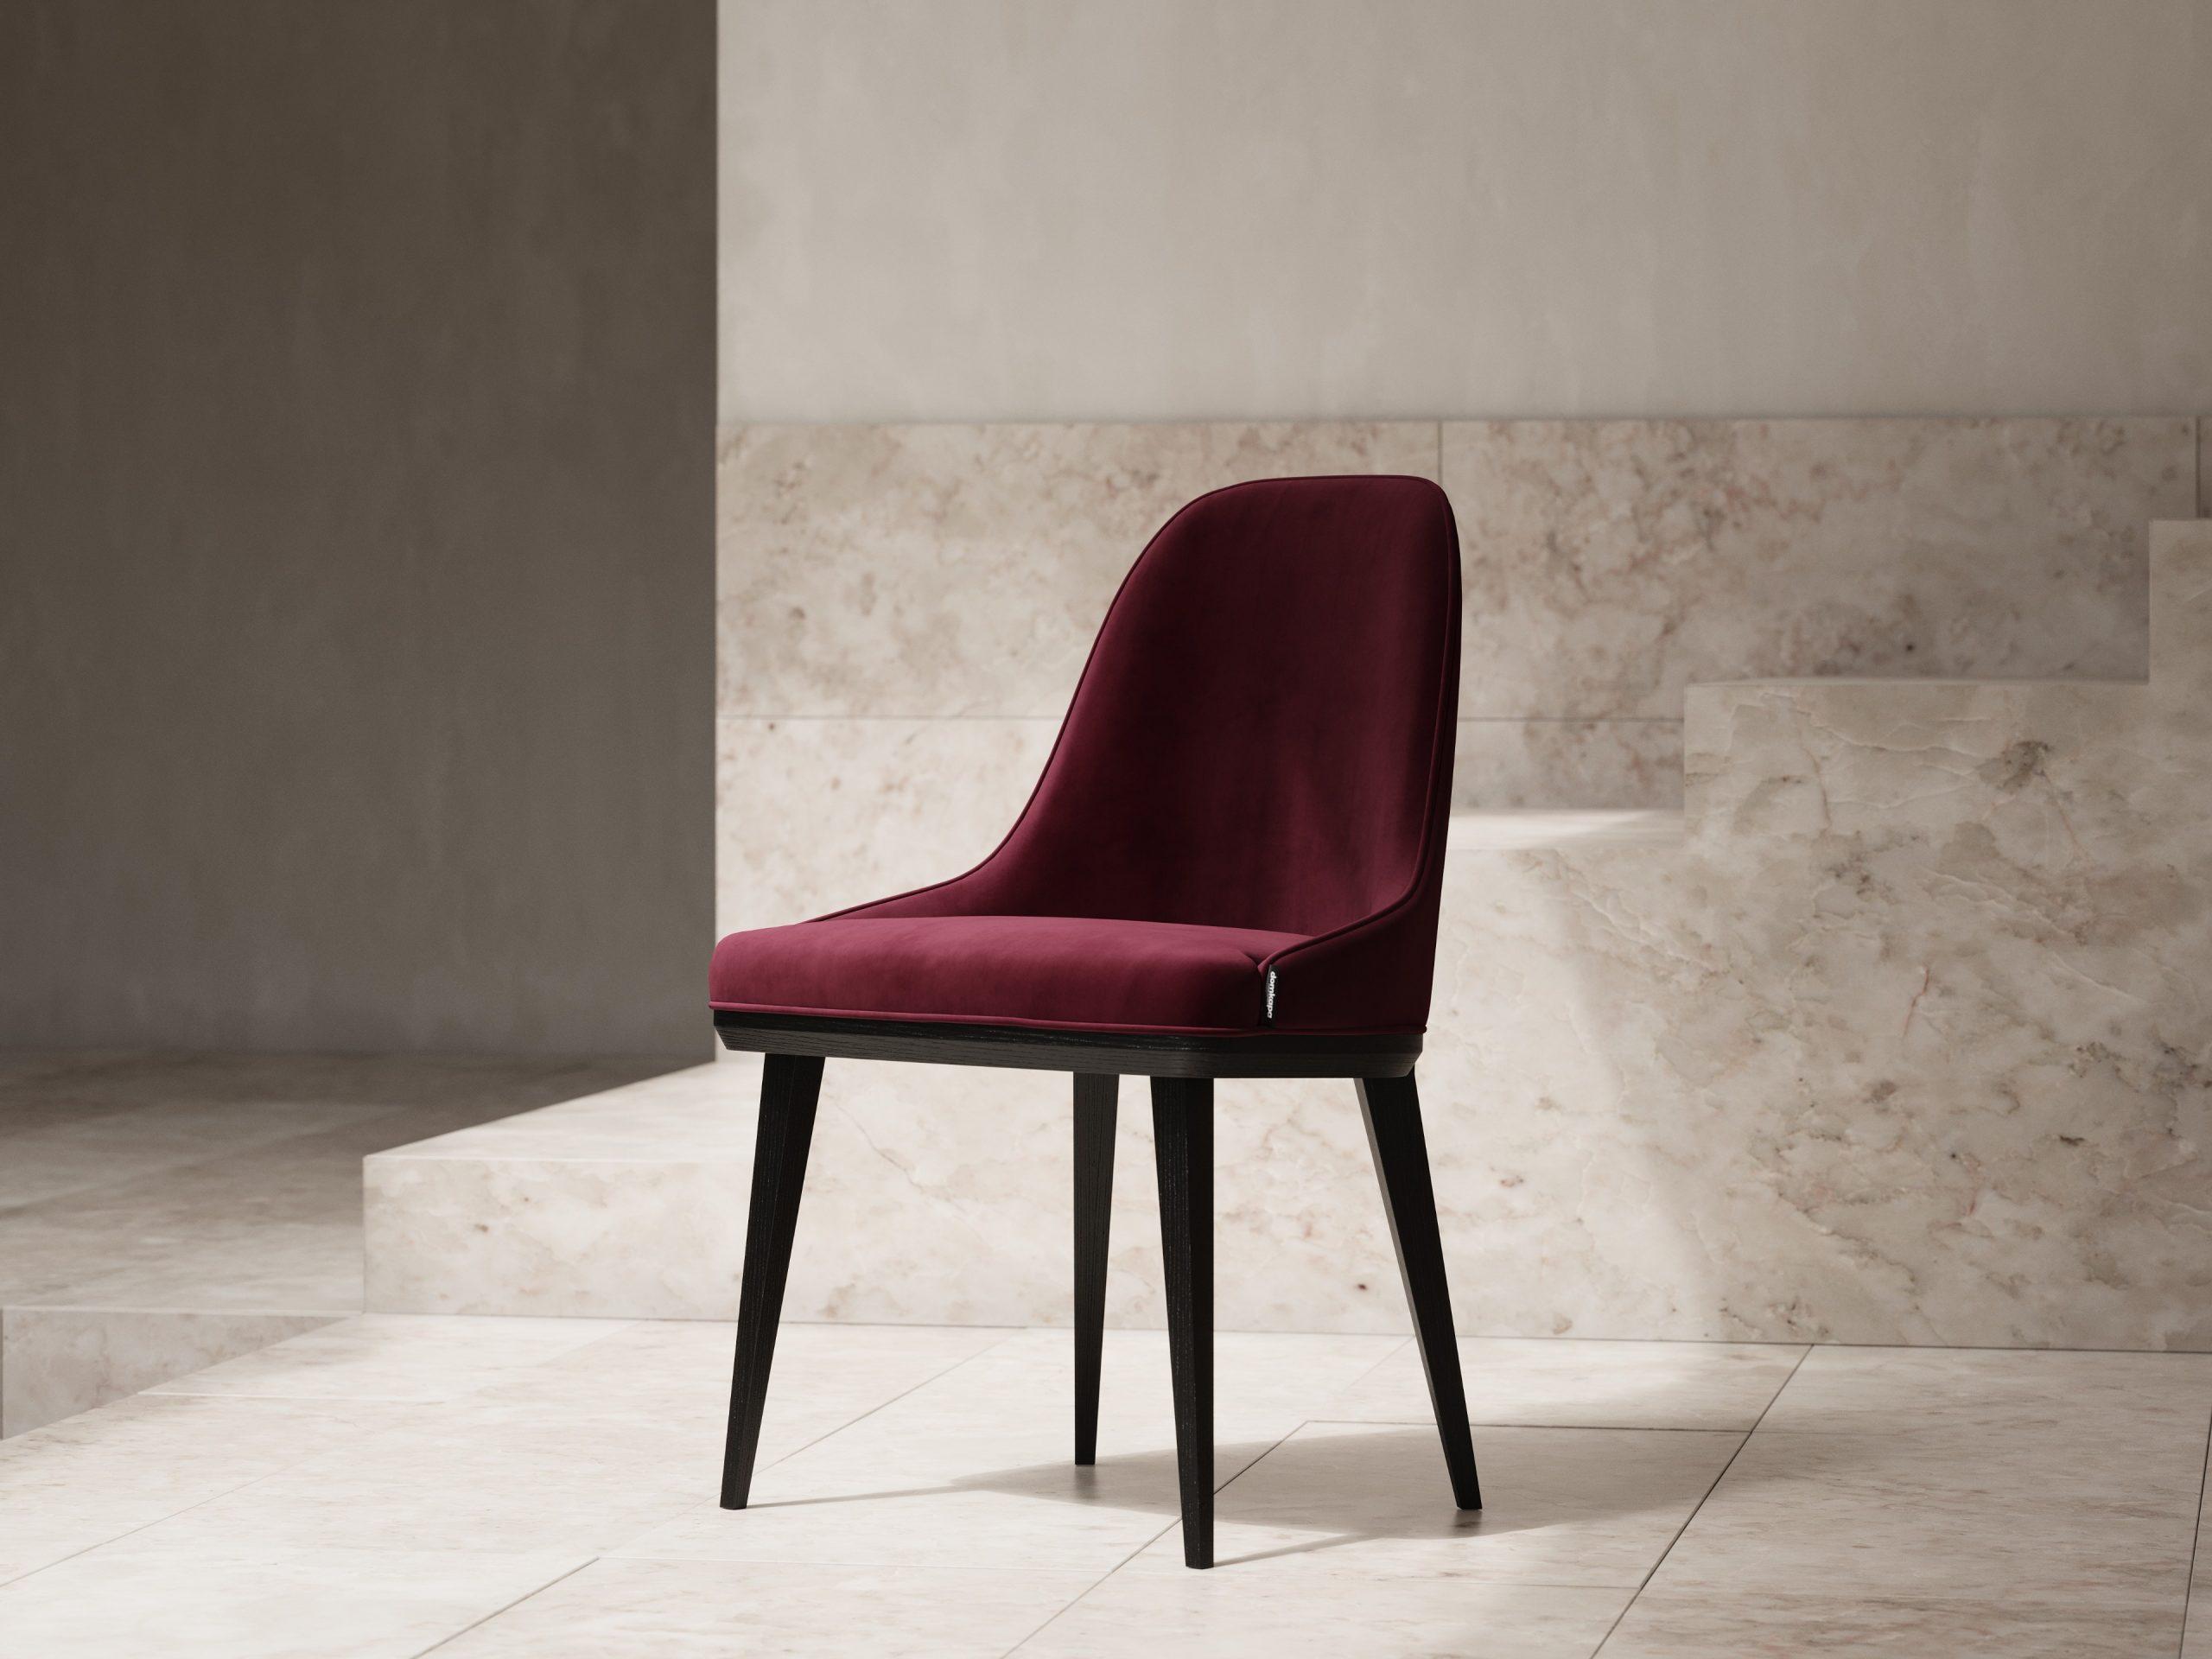 cadeira-binoche-velvet-dining-room-domkapa-7